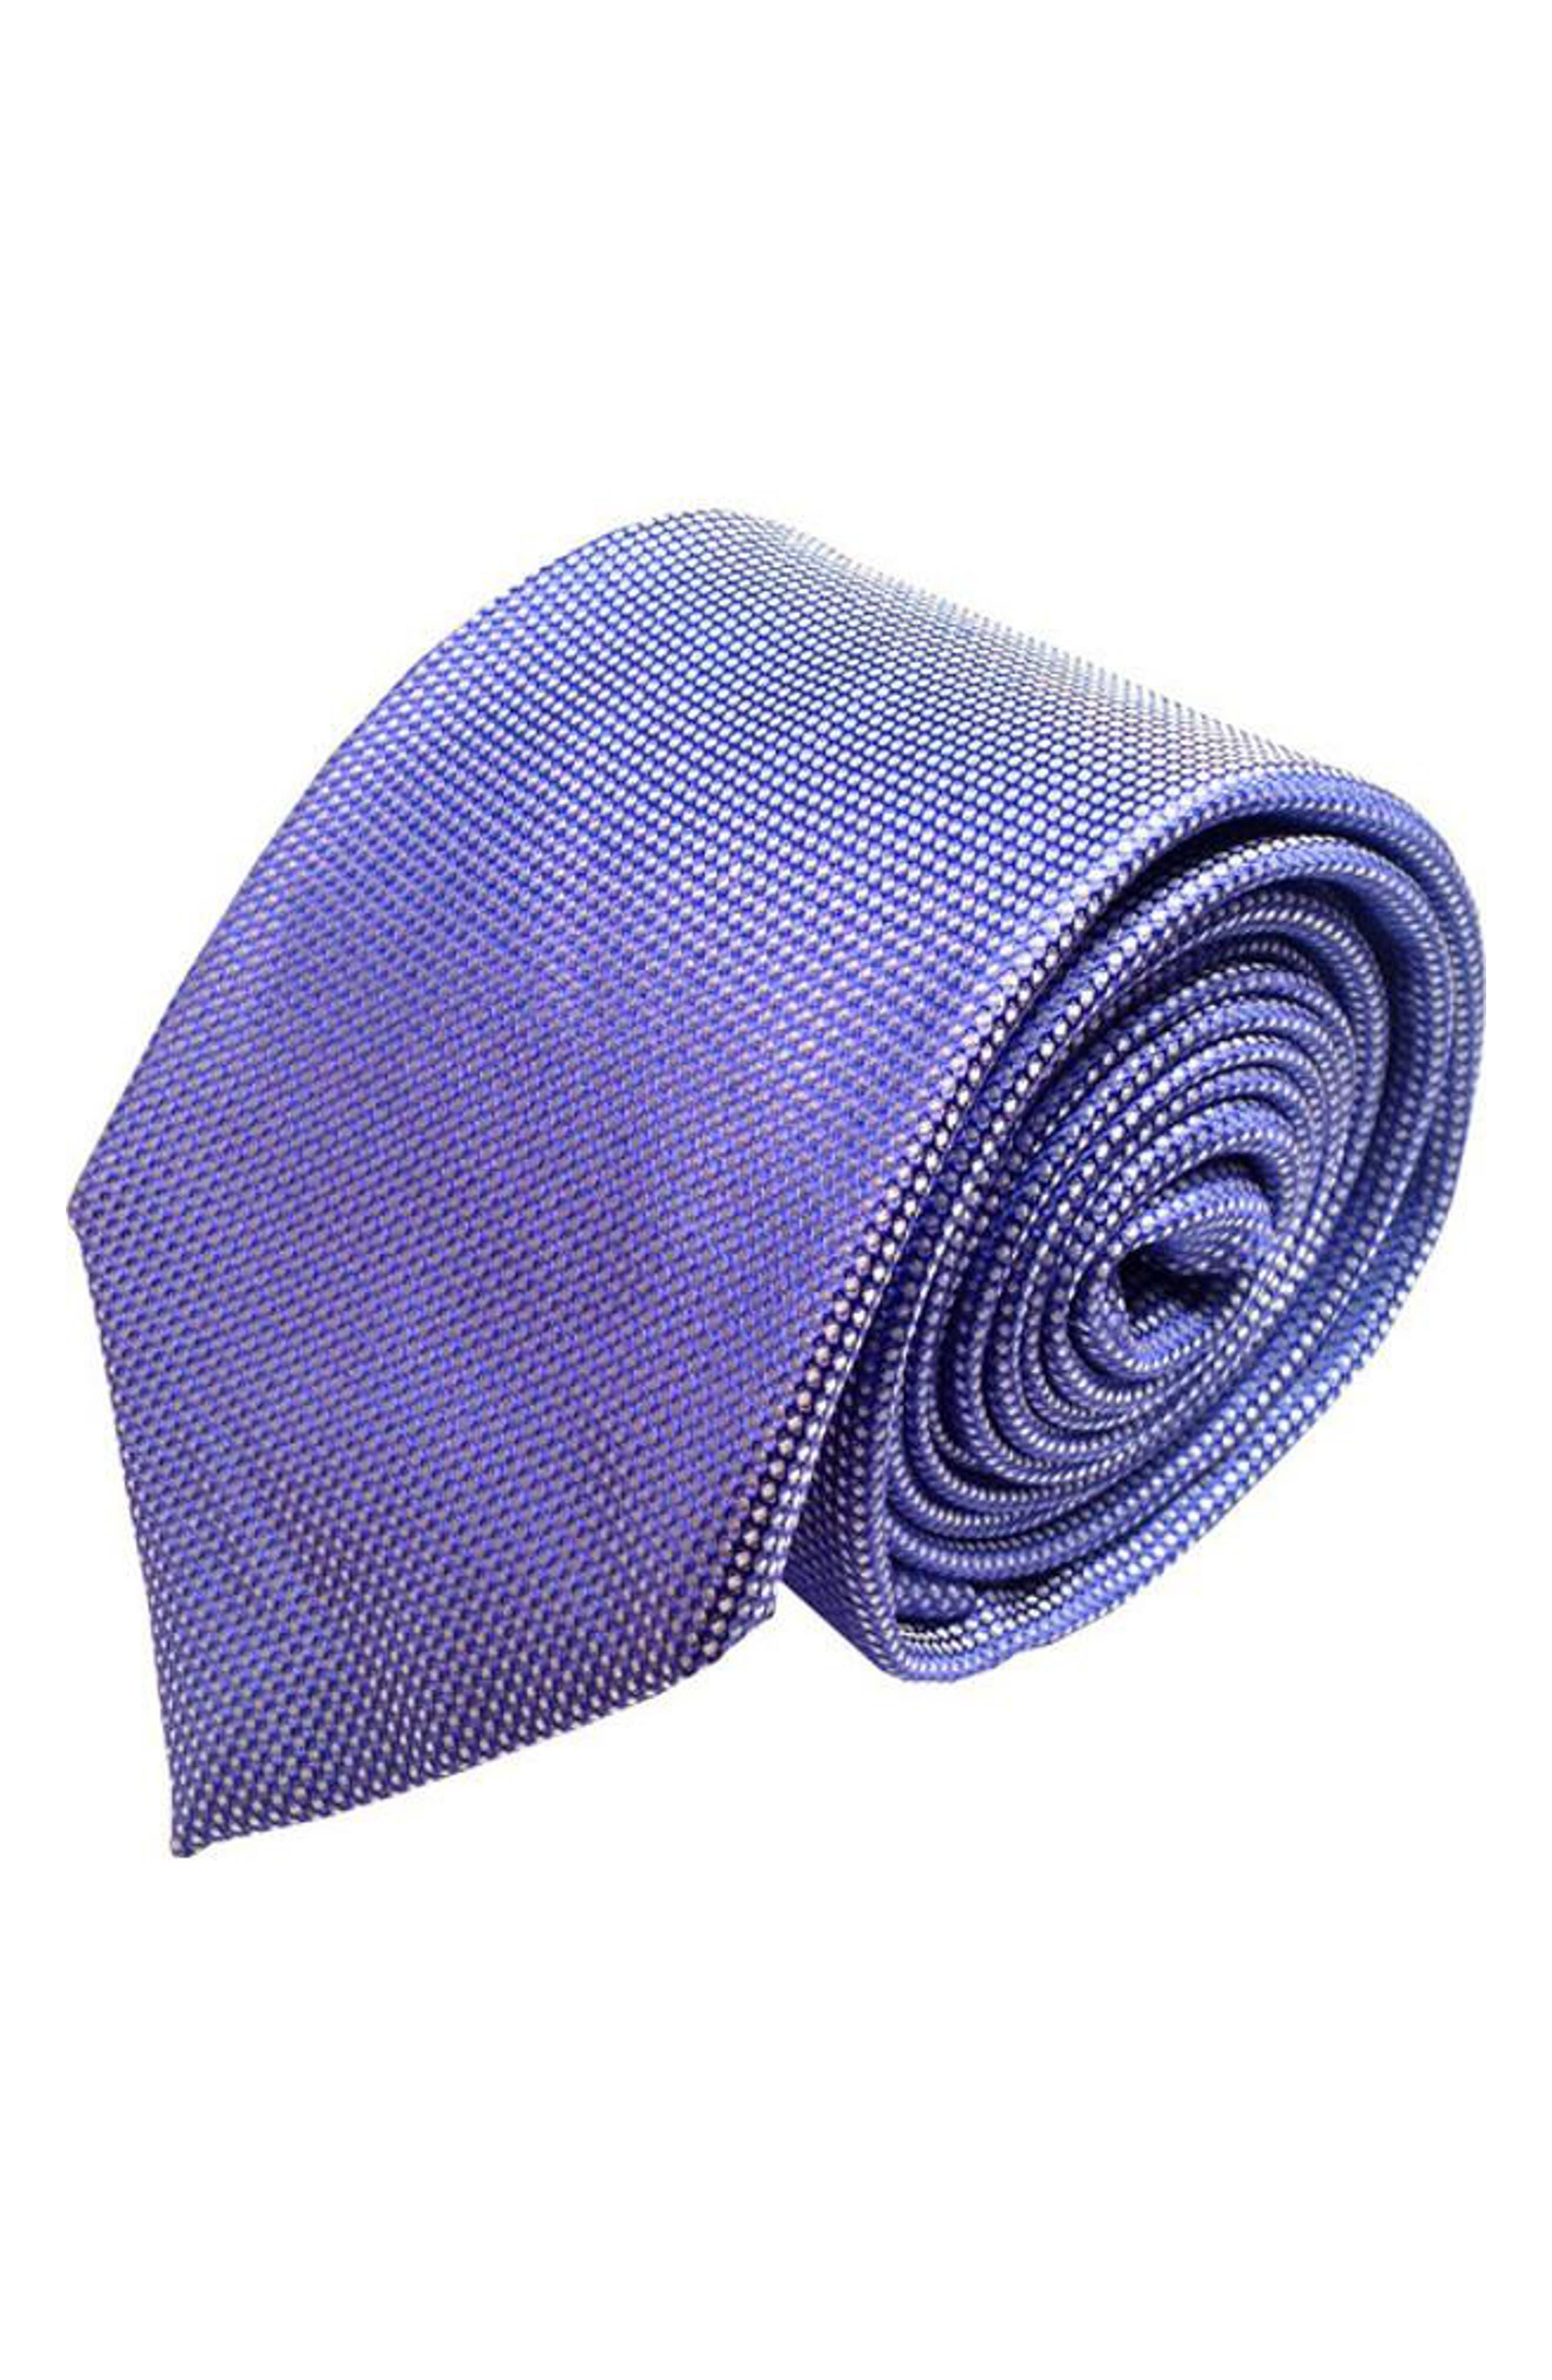 Mullet Silk Tie,                             Main thumbnail 1, color,                             Blue